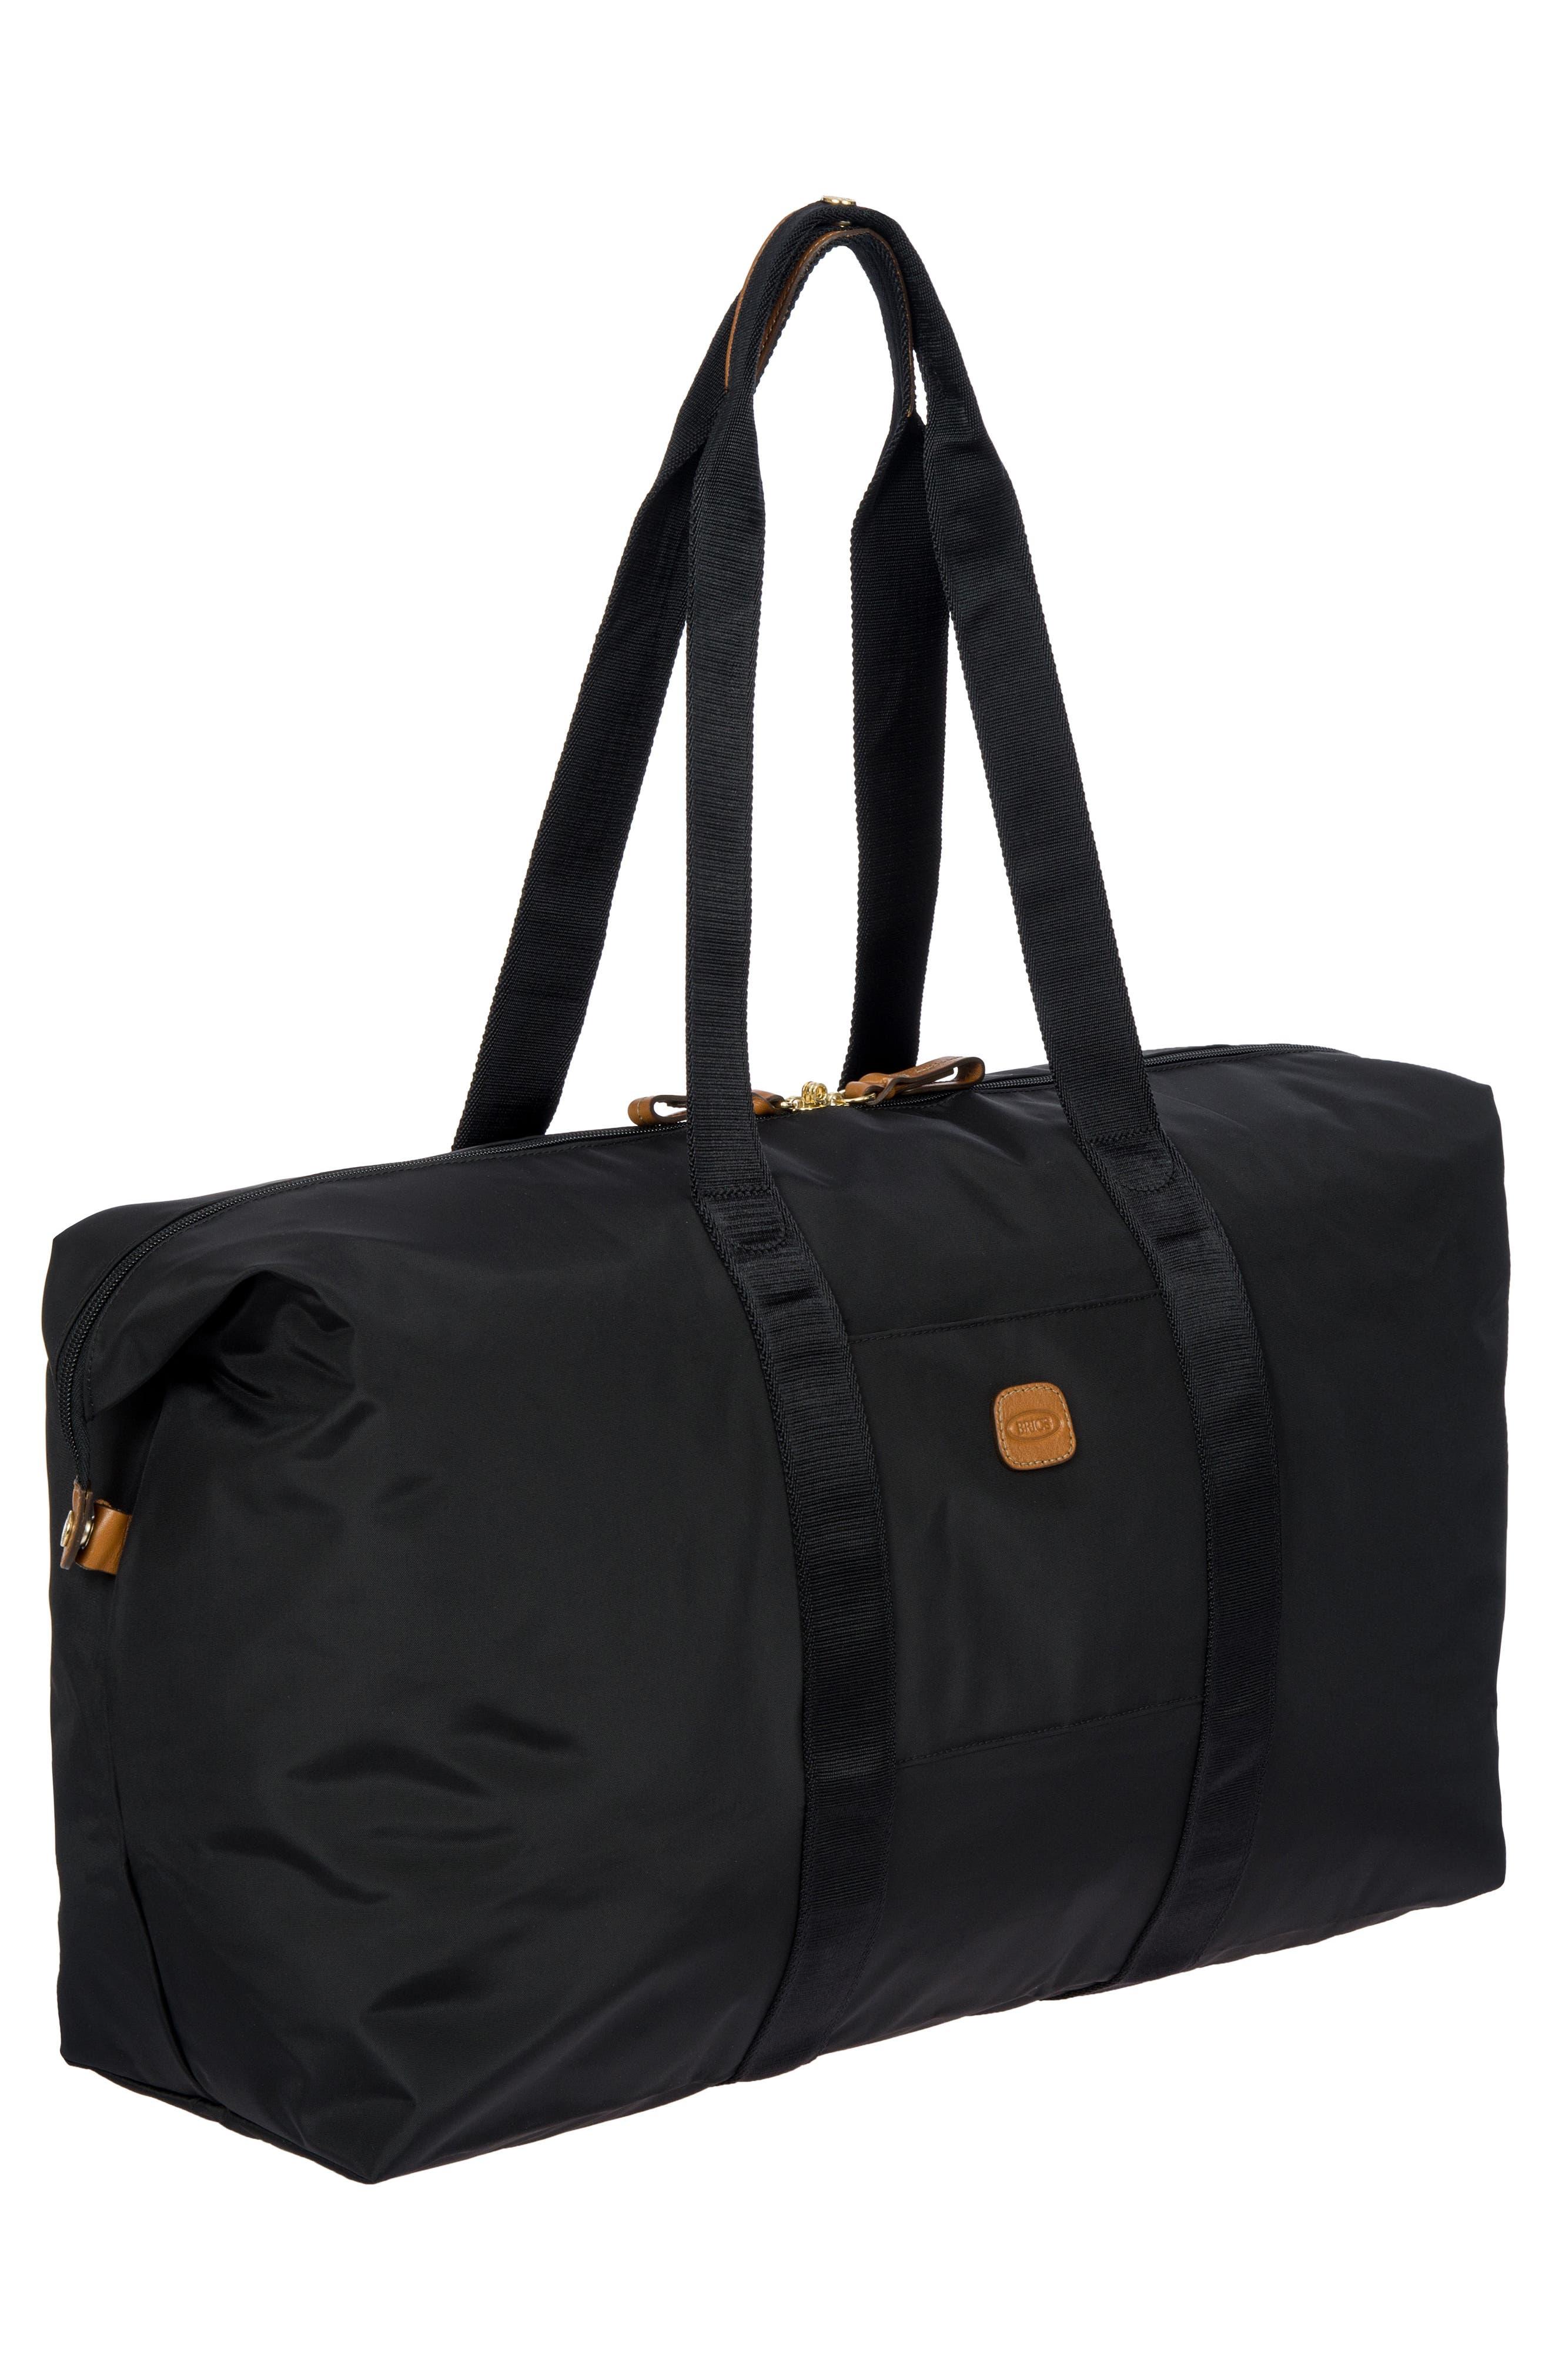 X-Bag 22-Inch Folding Duffel Bag,                             Alternate thumbnail 4, color,                             BLACK